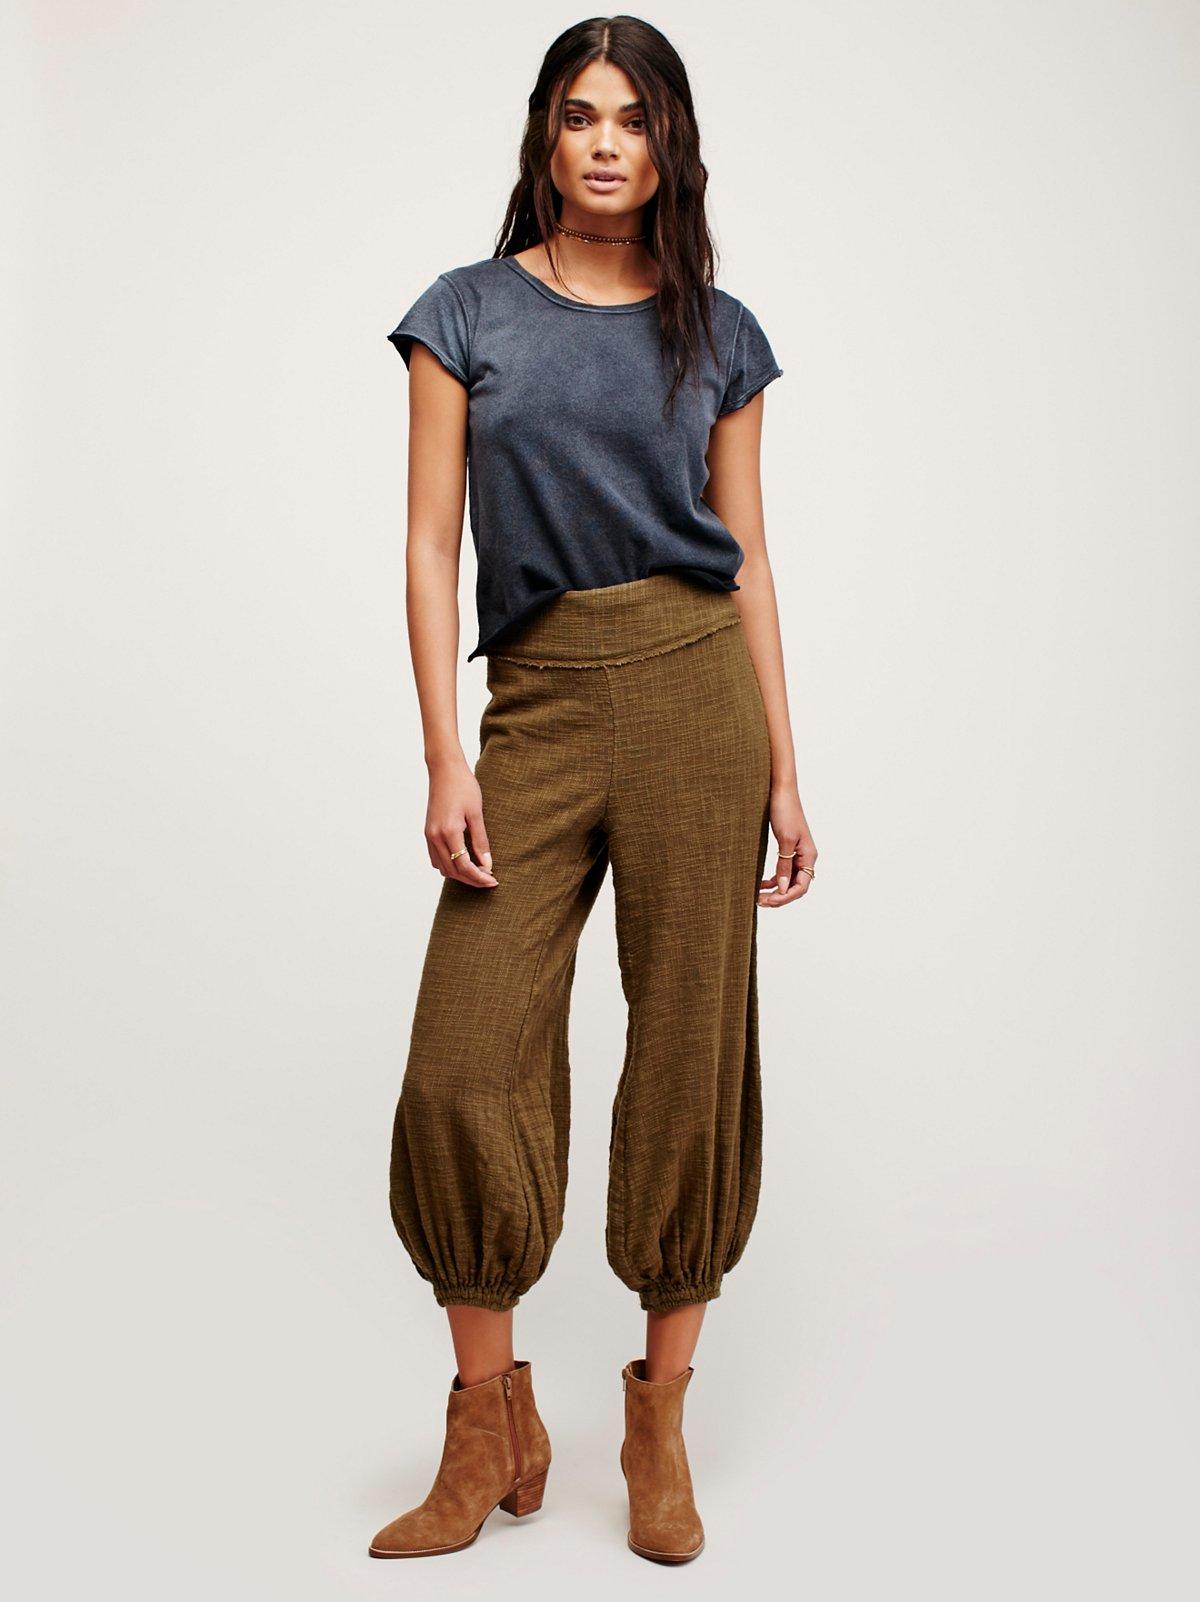 The Serita长裤